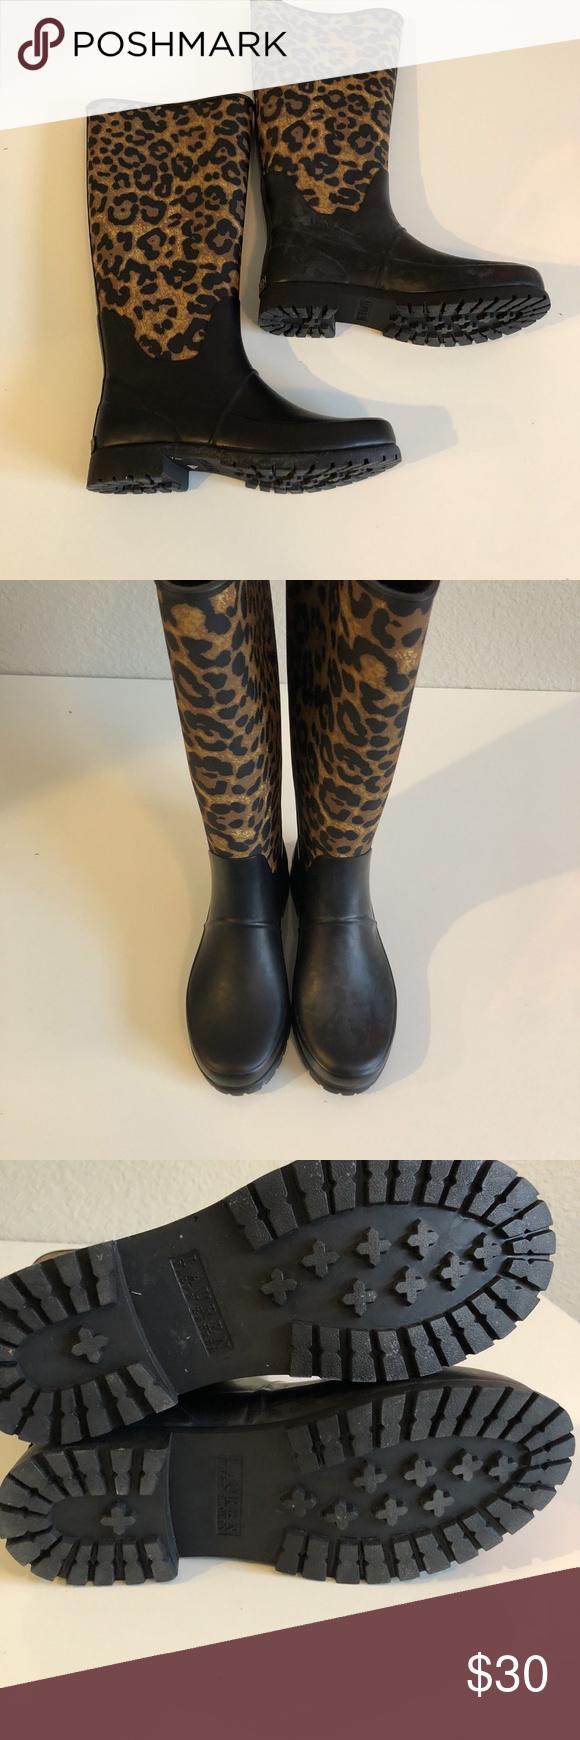 "9493303e84 Lauren By Ralph Lauren Women Bethany Sz 7 Lauren By Ralph Lauren Women s  Bethany Bo Ra Flat Leopard Rain Boots Rubber Sz 7 Condition  New with  defects "" ..."